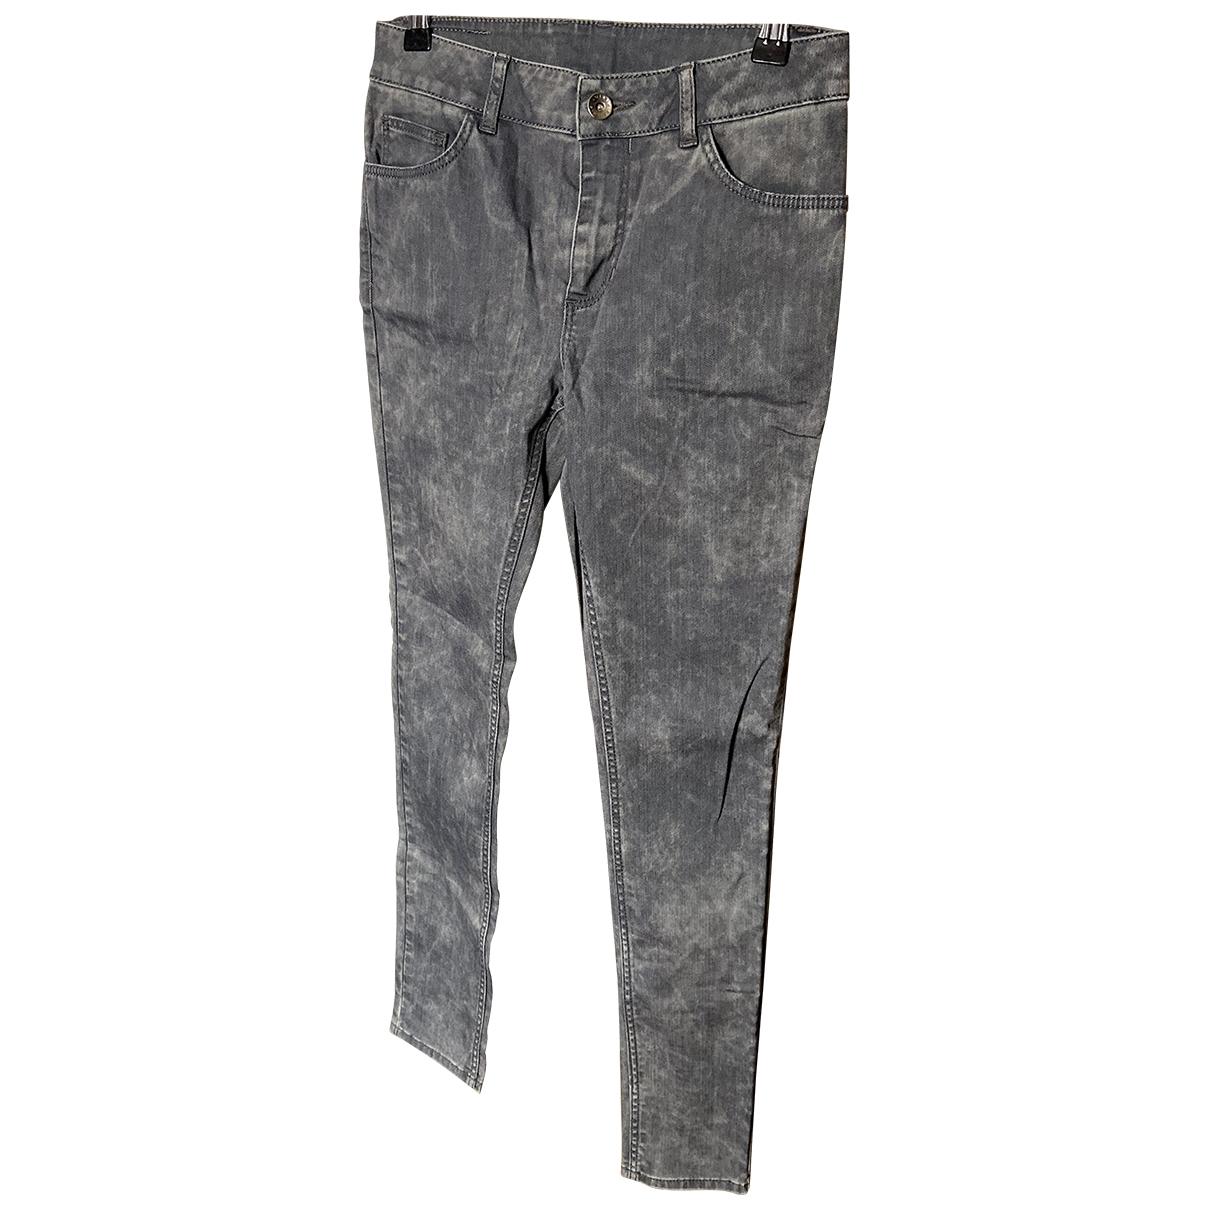 Claudie Pierlot \N Grey Jeans for Women 36 FR